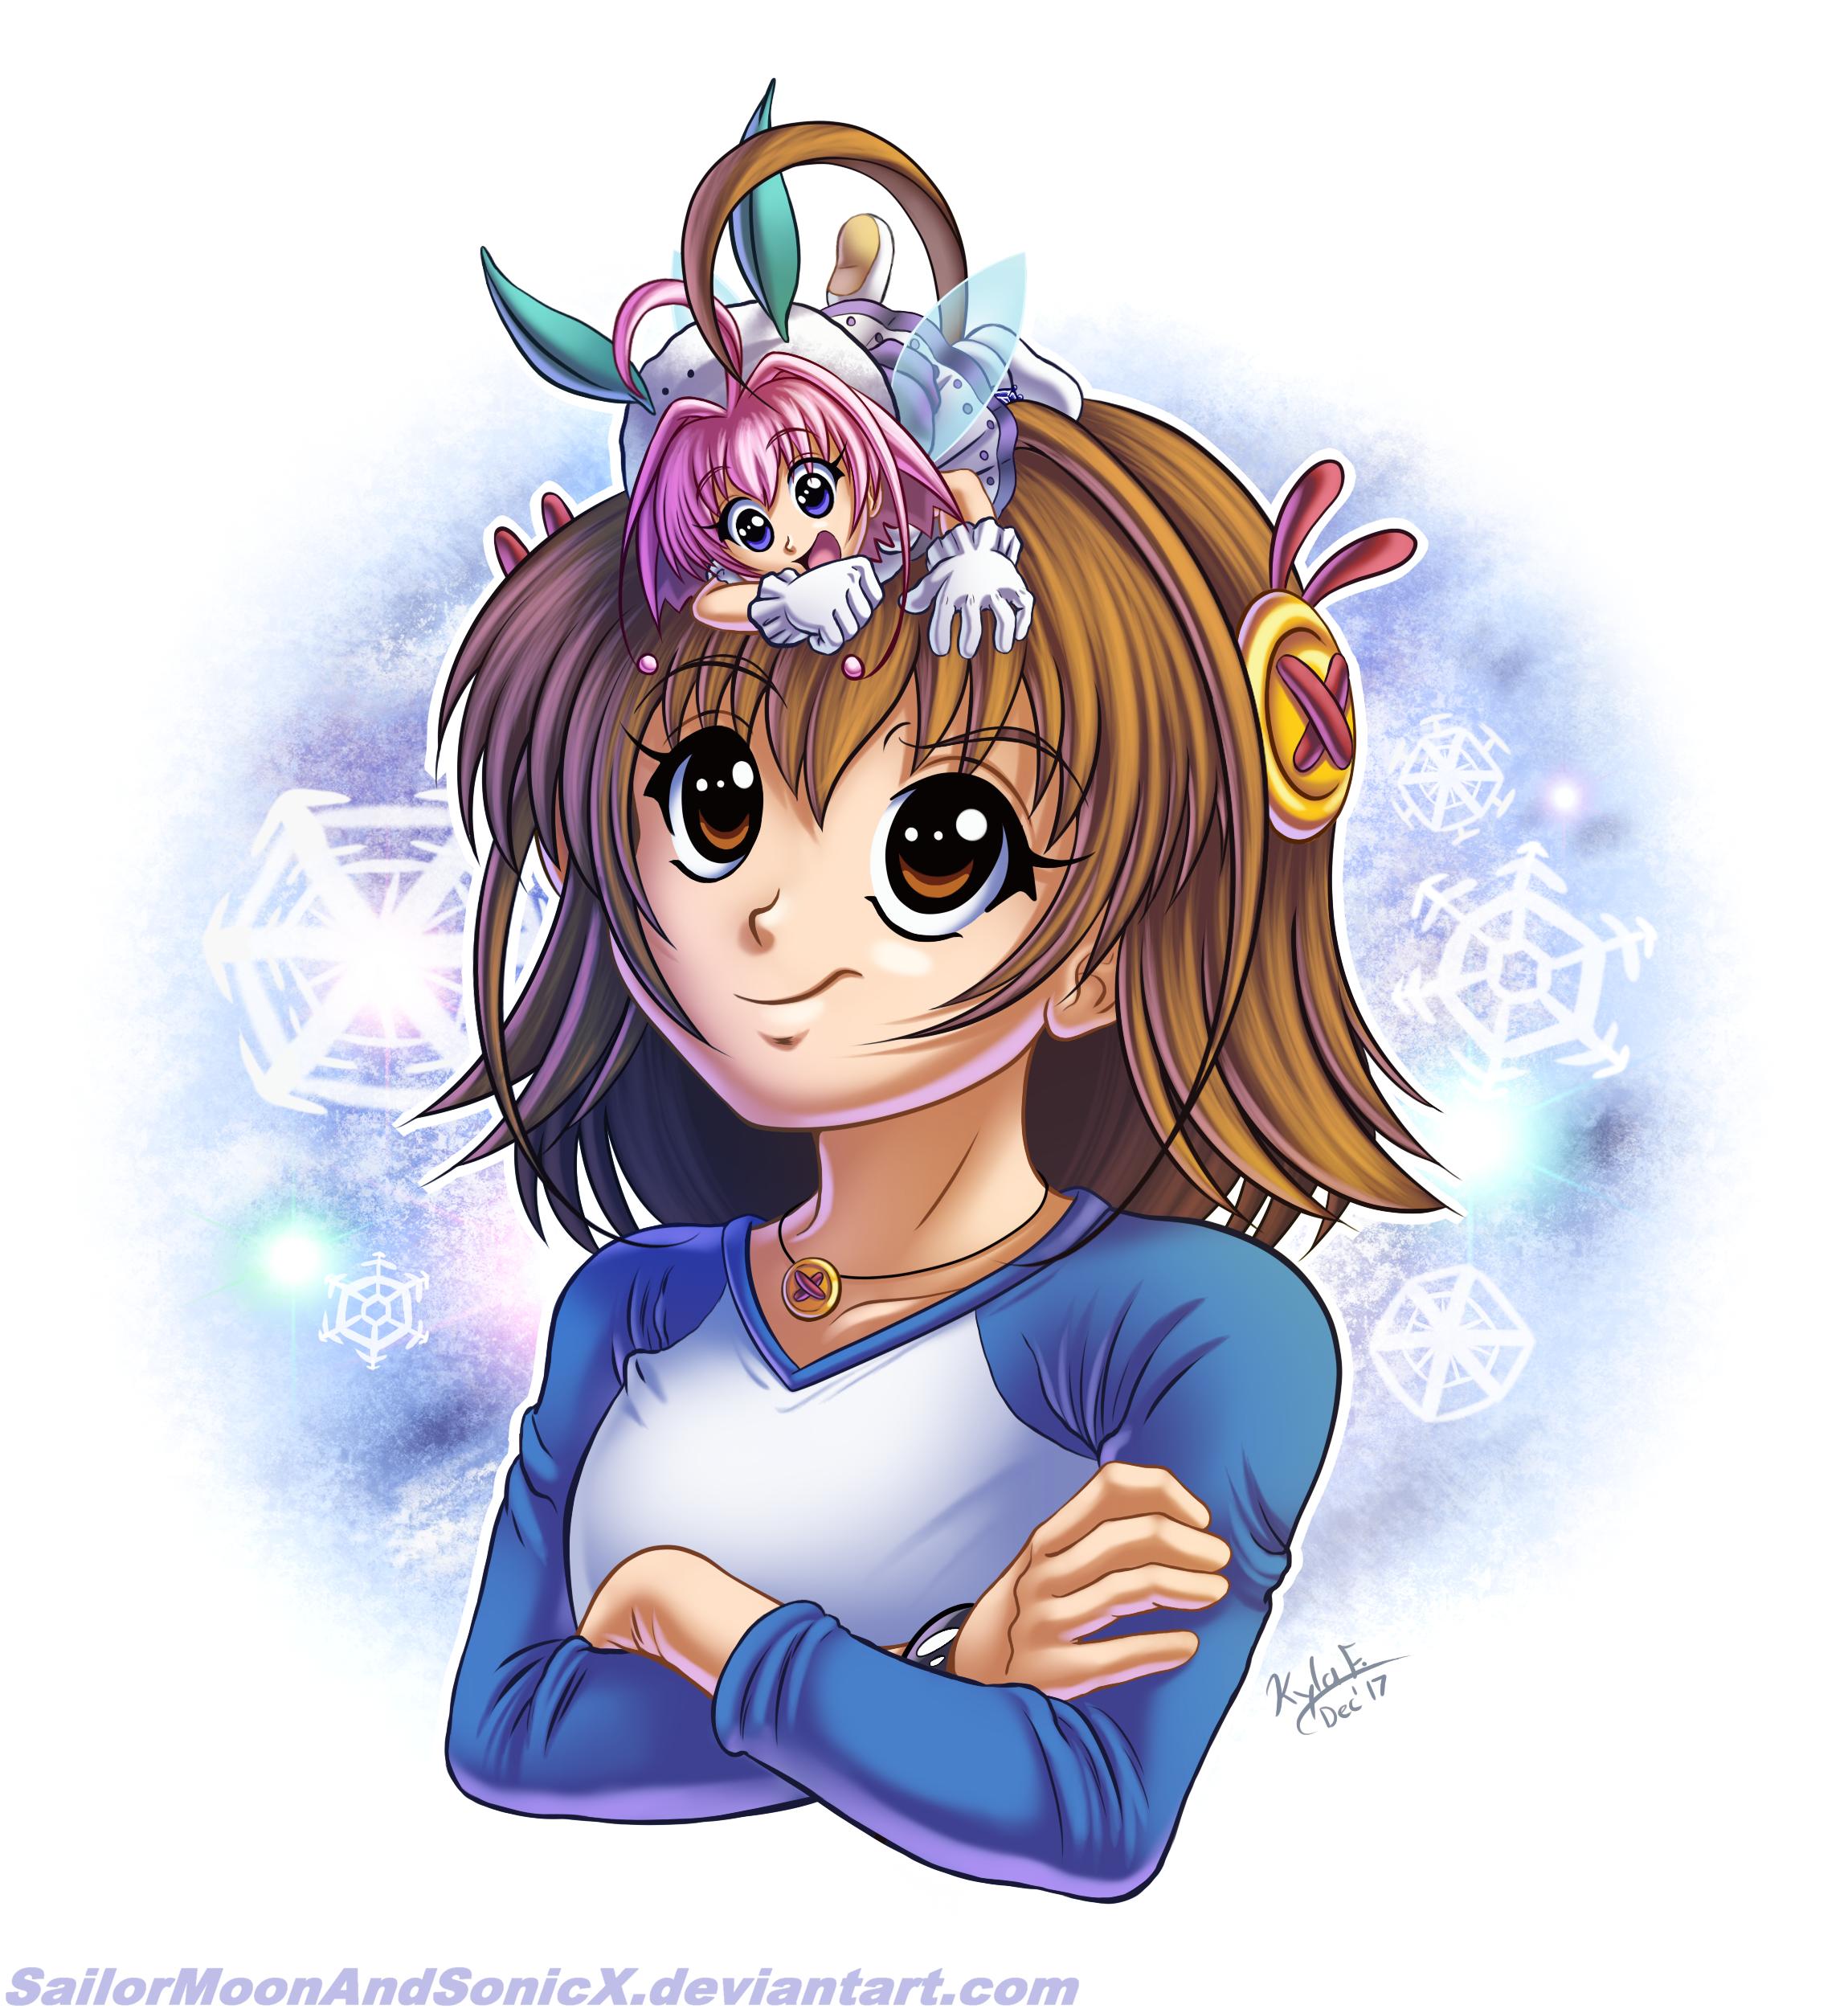 SailorMoonAndSonicX's Profile Picture